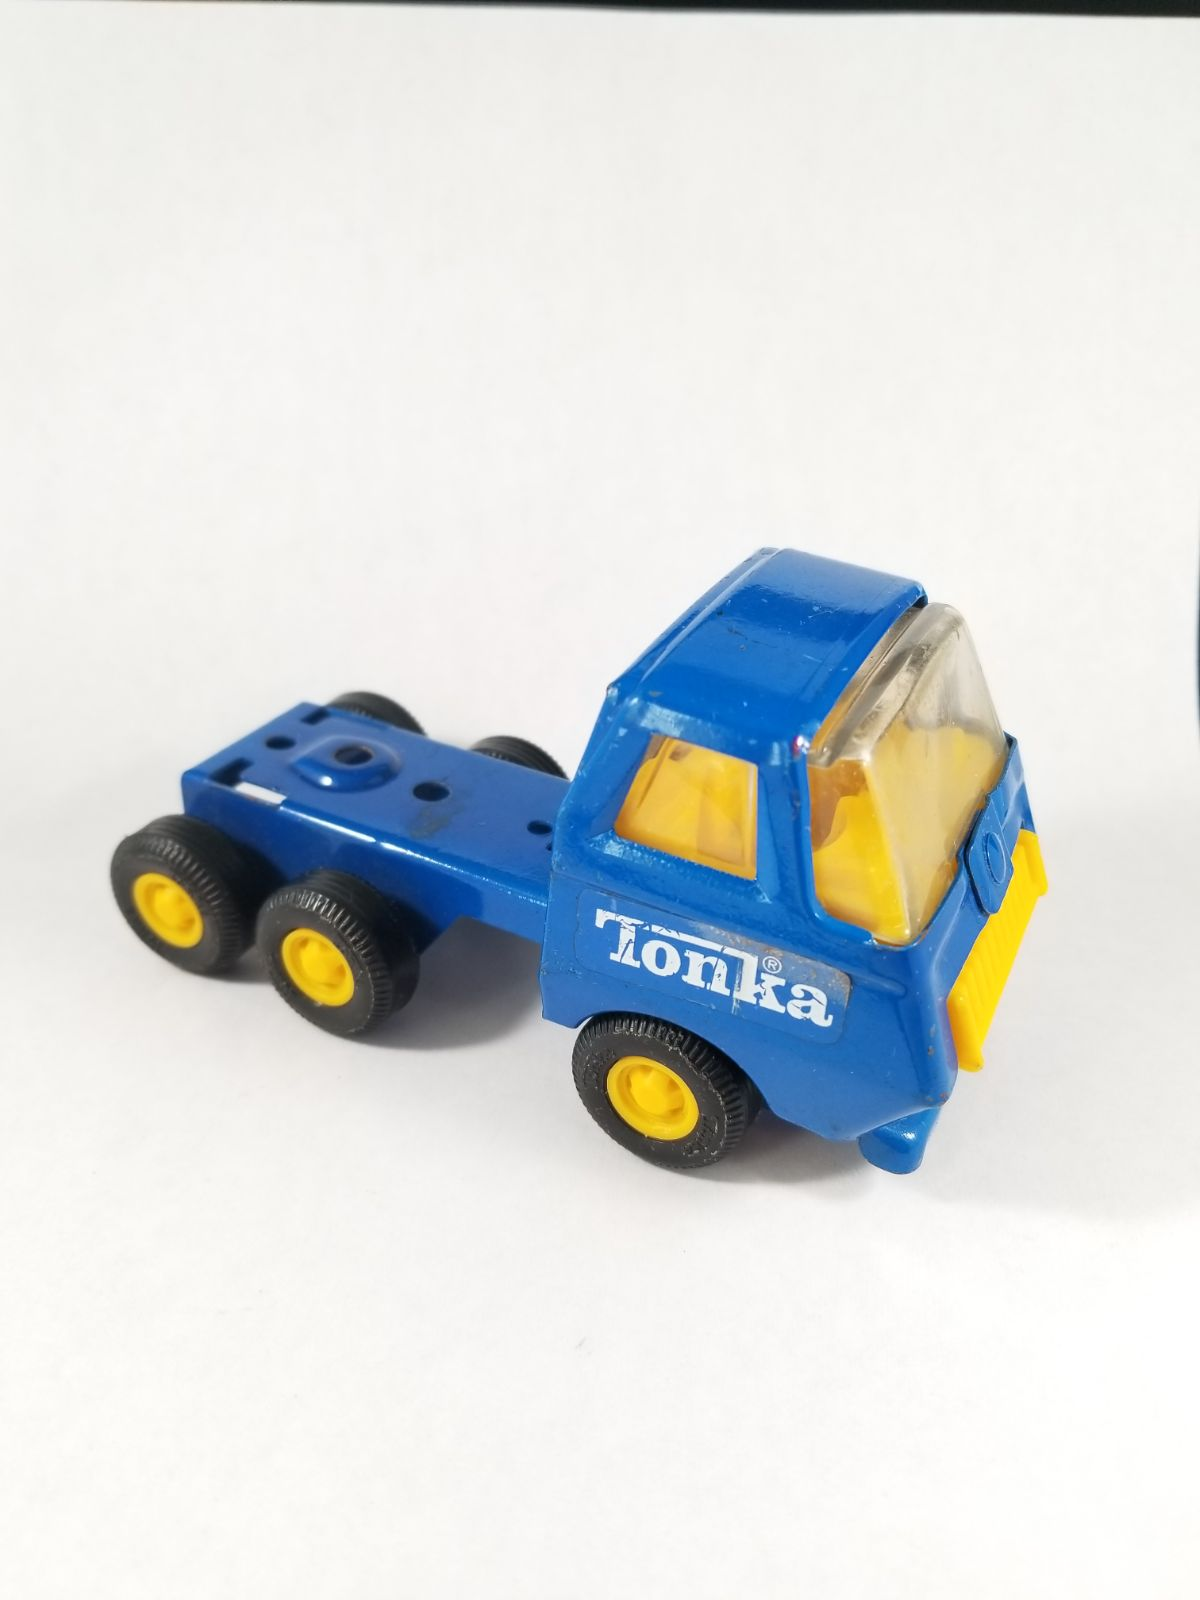 TONKA Metal Truck